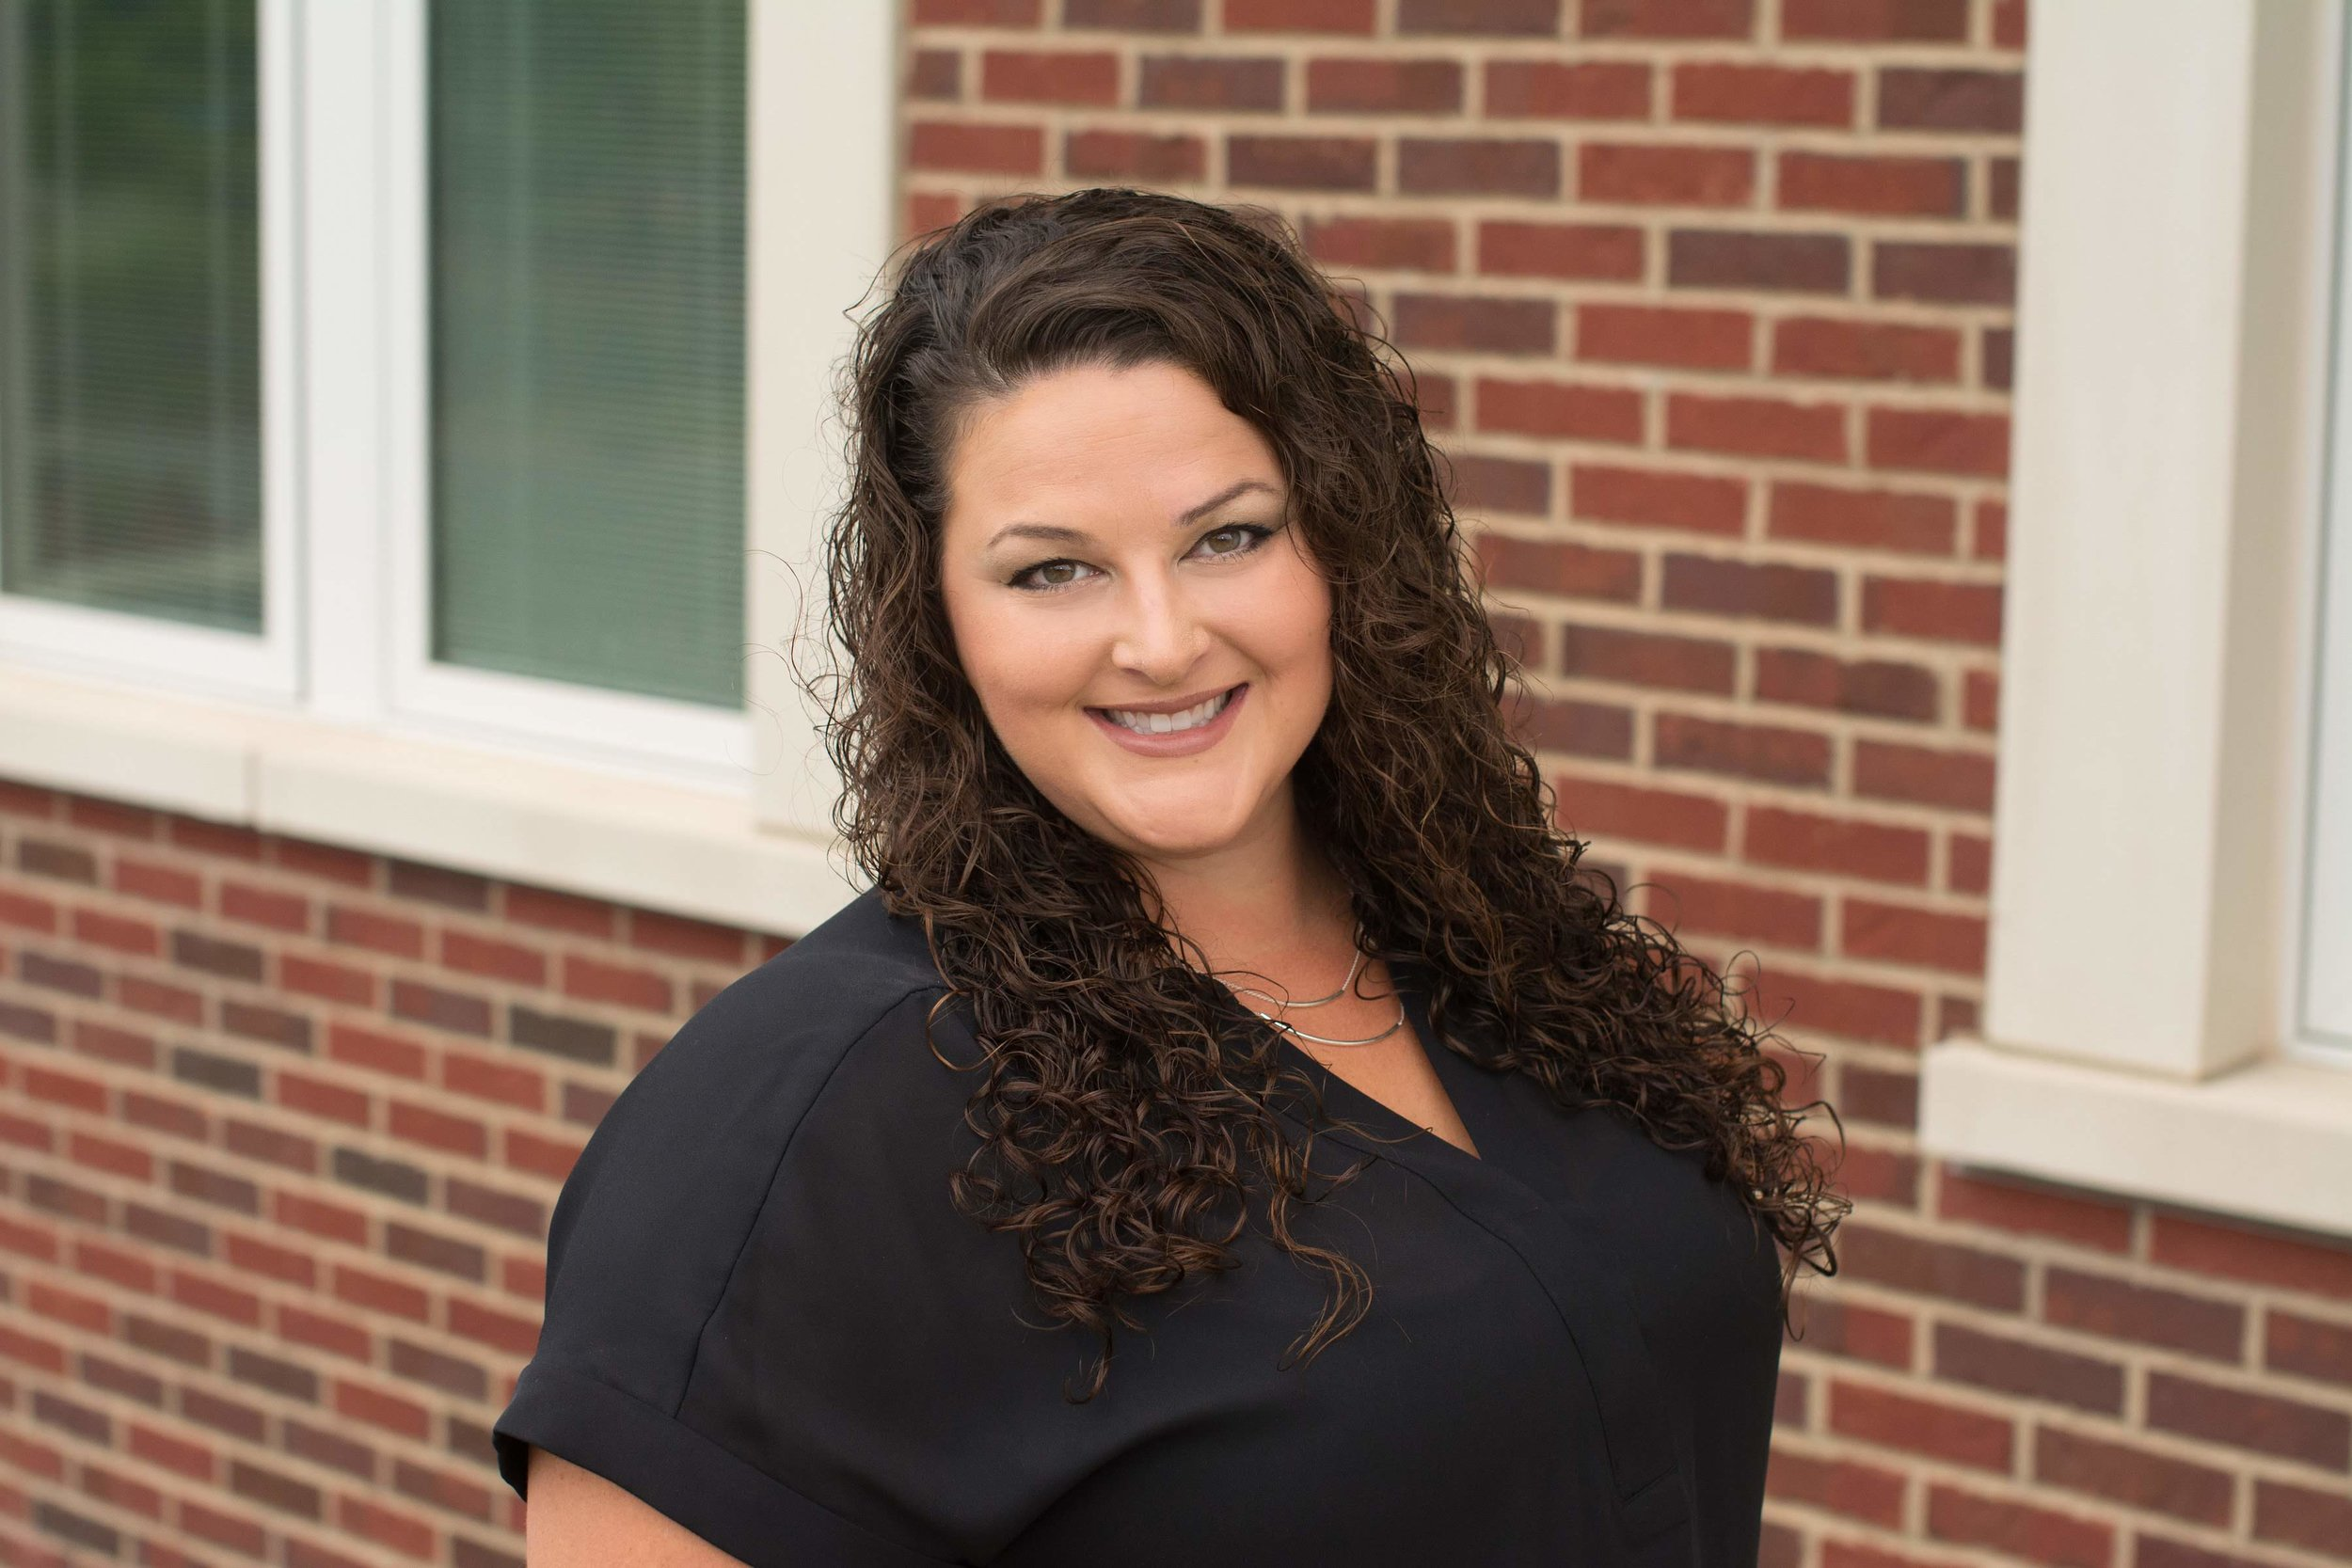 Melissa - Hygiene Coordinator